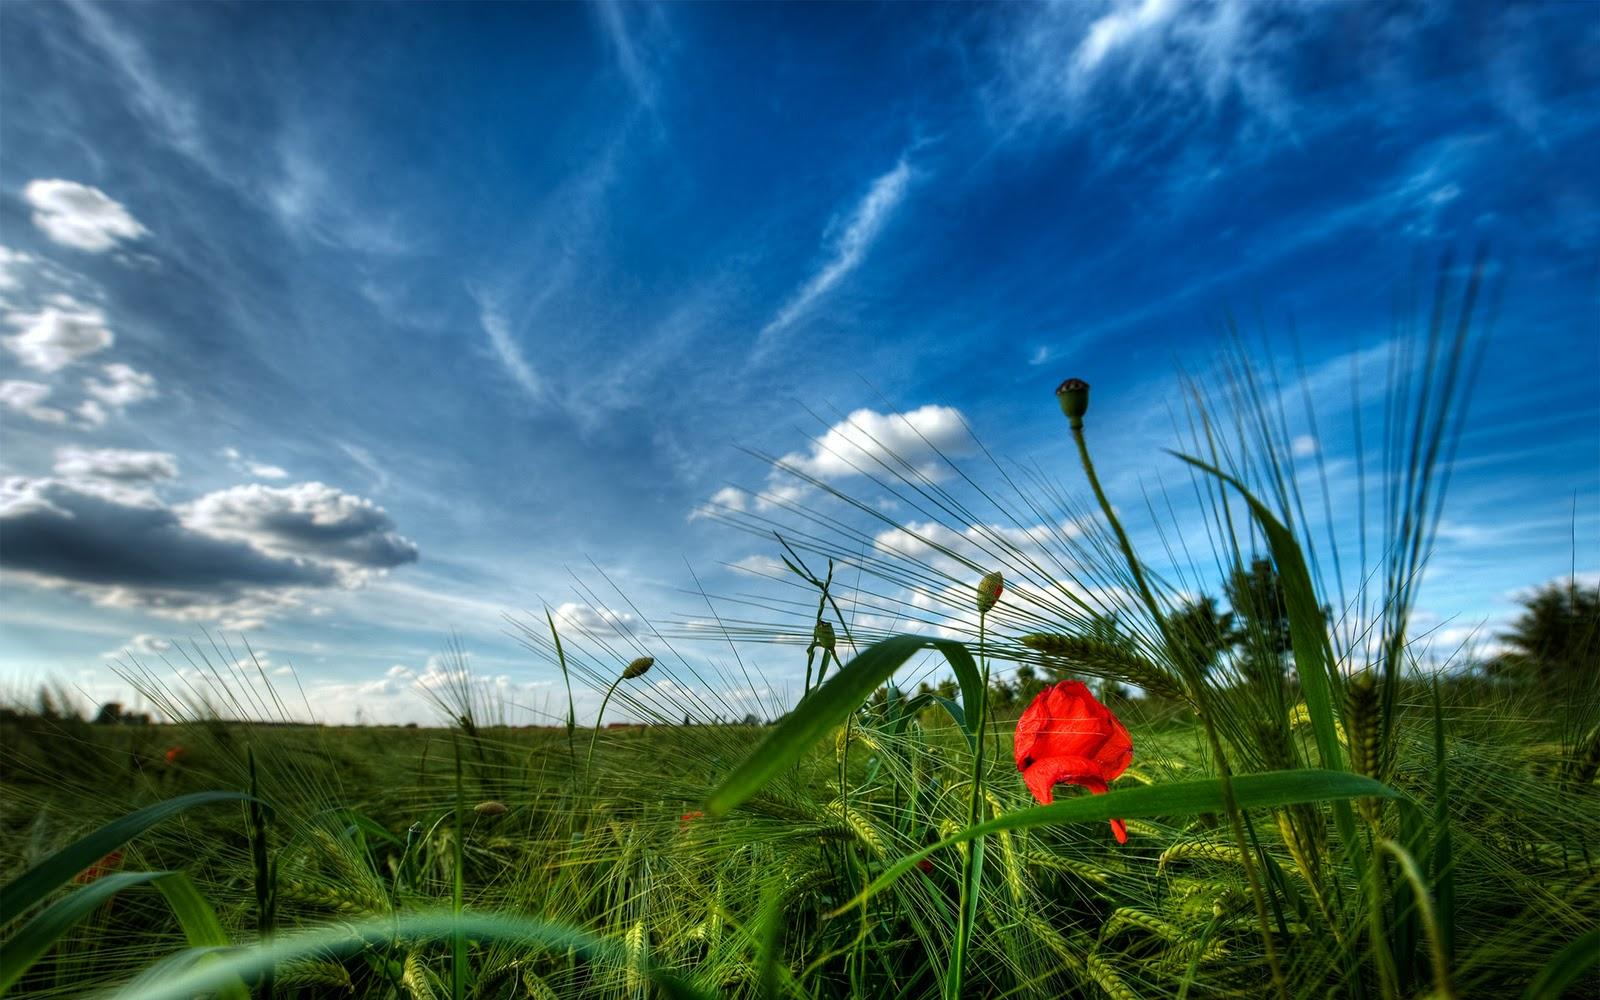 http://4.bp.blogspot.com/-flTtQtQXm9E/UIae3wLPdgI/AAAAAAAAAuU/QKJ-j4_HAkk/s1600/Flower+Field+Nature+HD+Wallpaper+-+FreeHDWall.Blogspot.Com.jpg